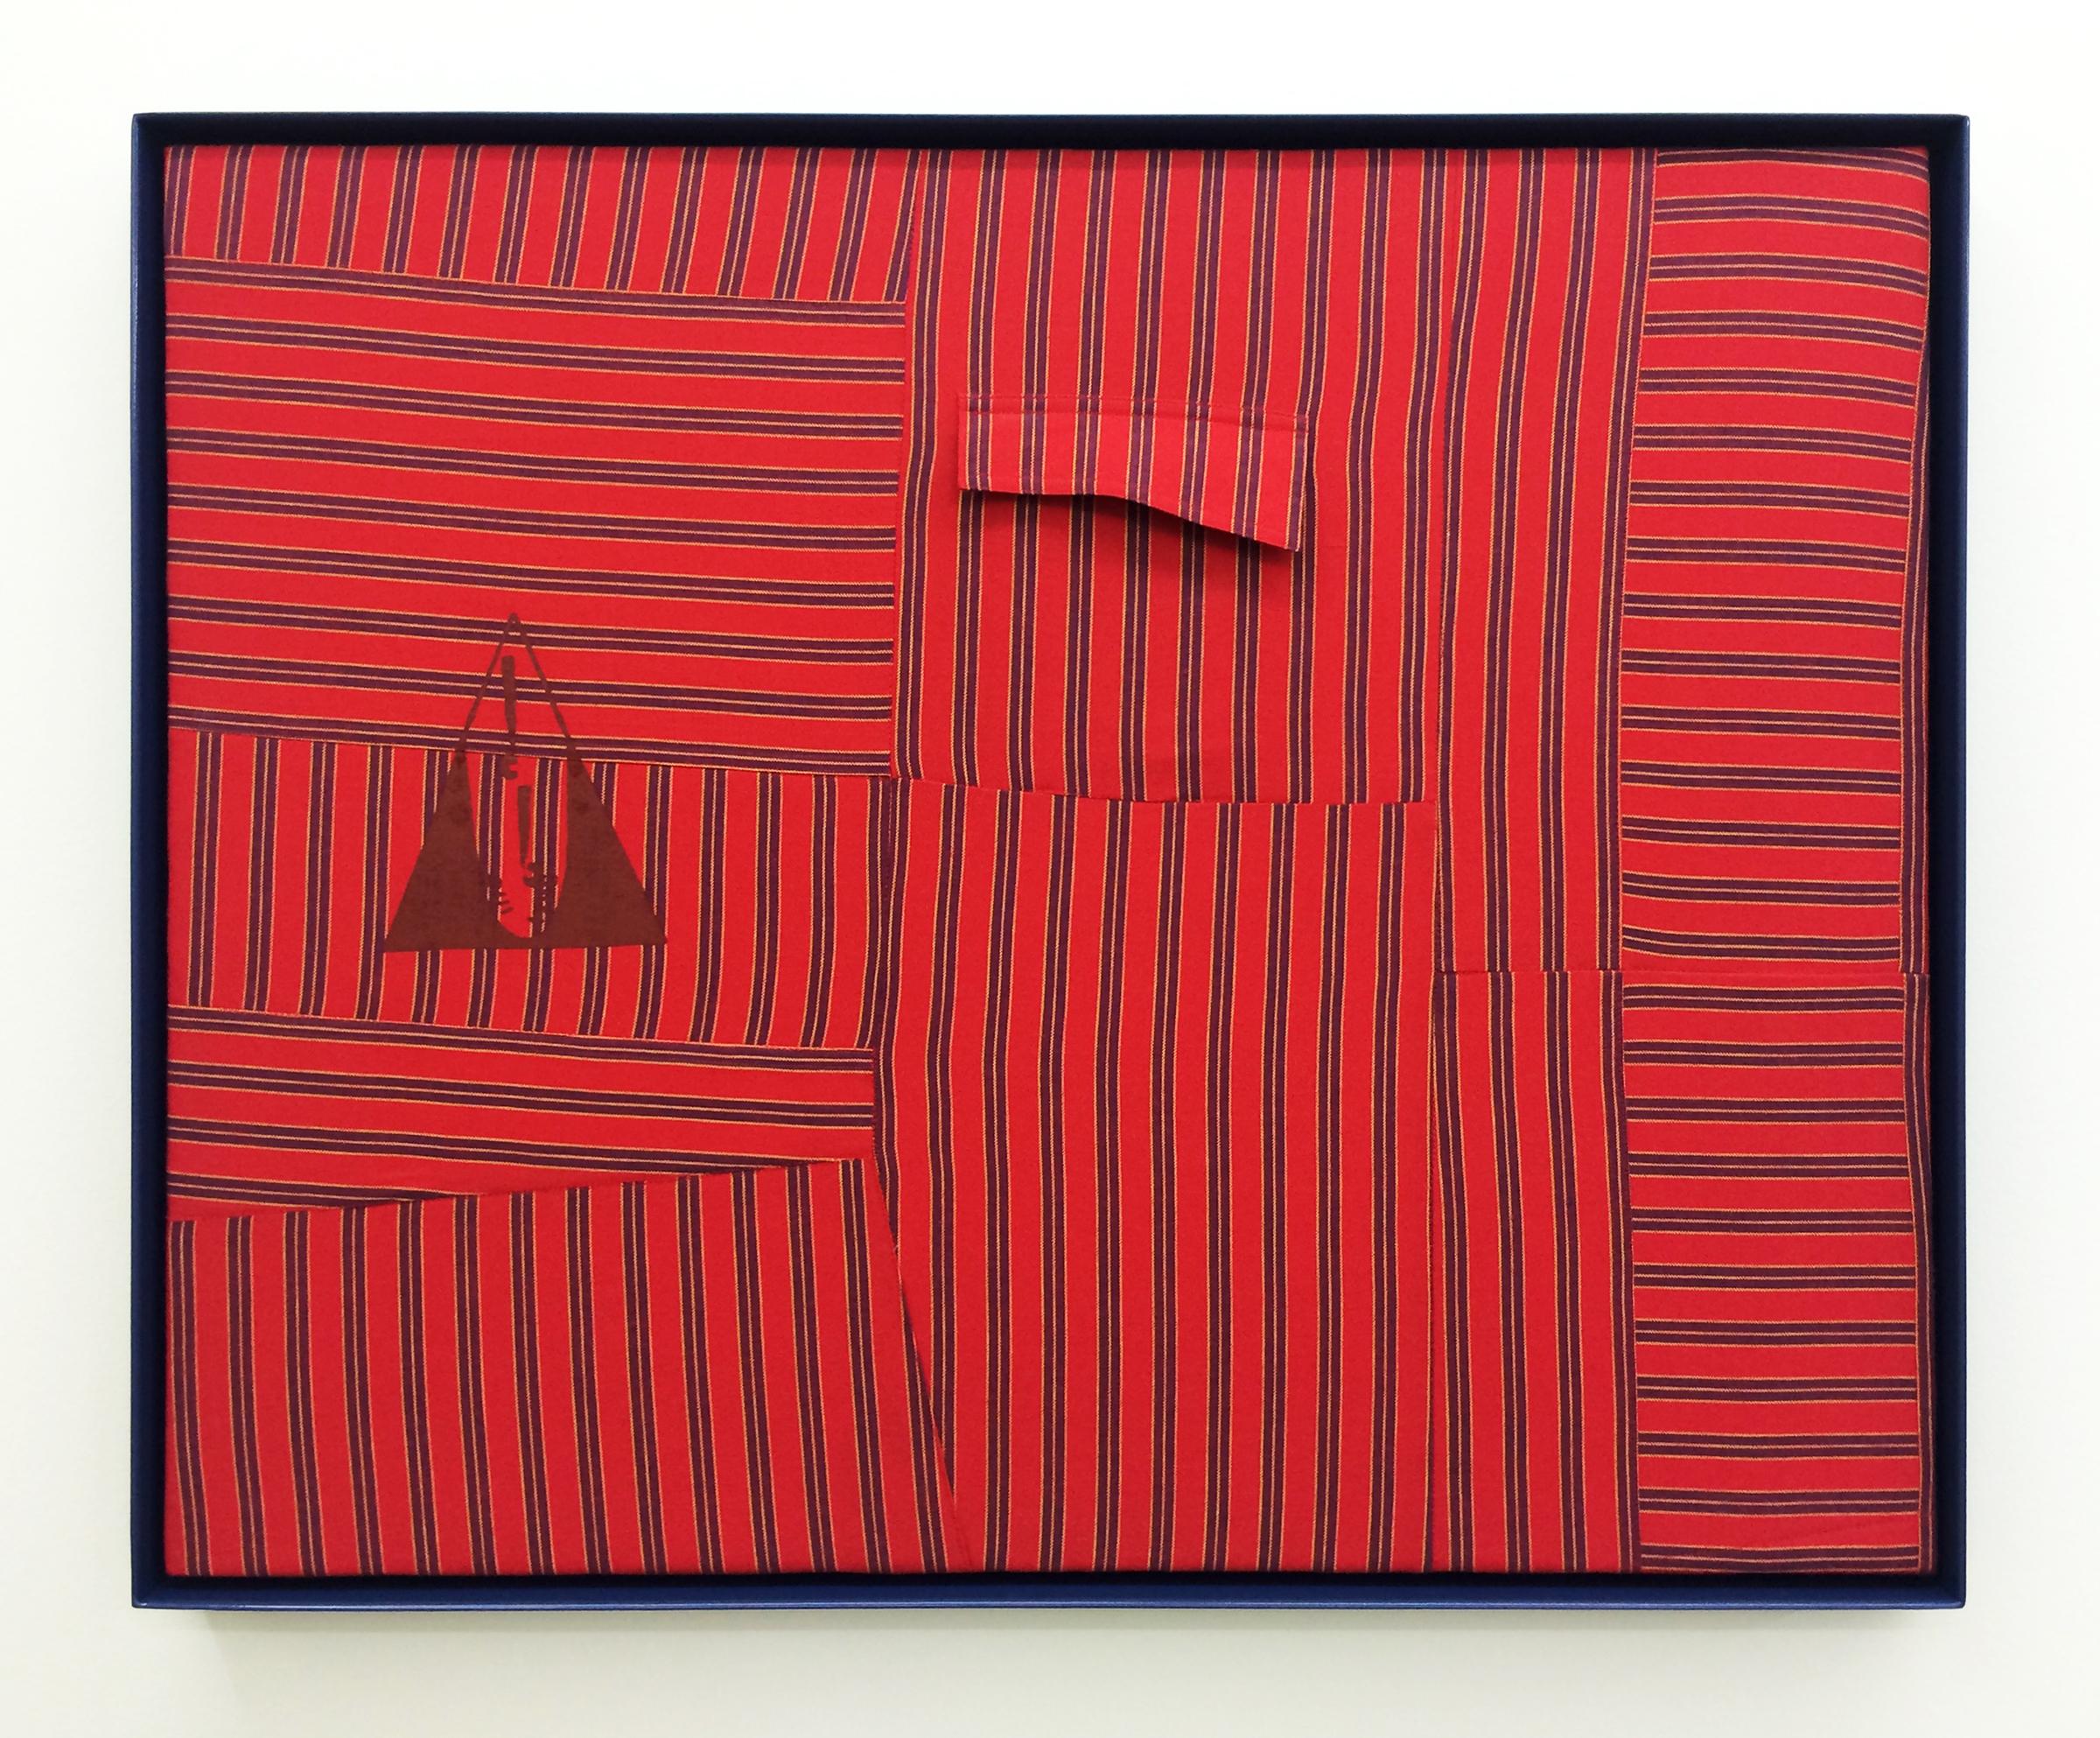 "AMANDA CURRERI   Qui Vive (Be Alert!), Red , 2016, vintage garment, acrylic, thread, cotton batting and powder coated aluminum frame, 24.5"" x 30.5"""